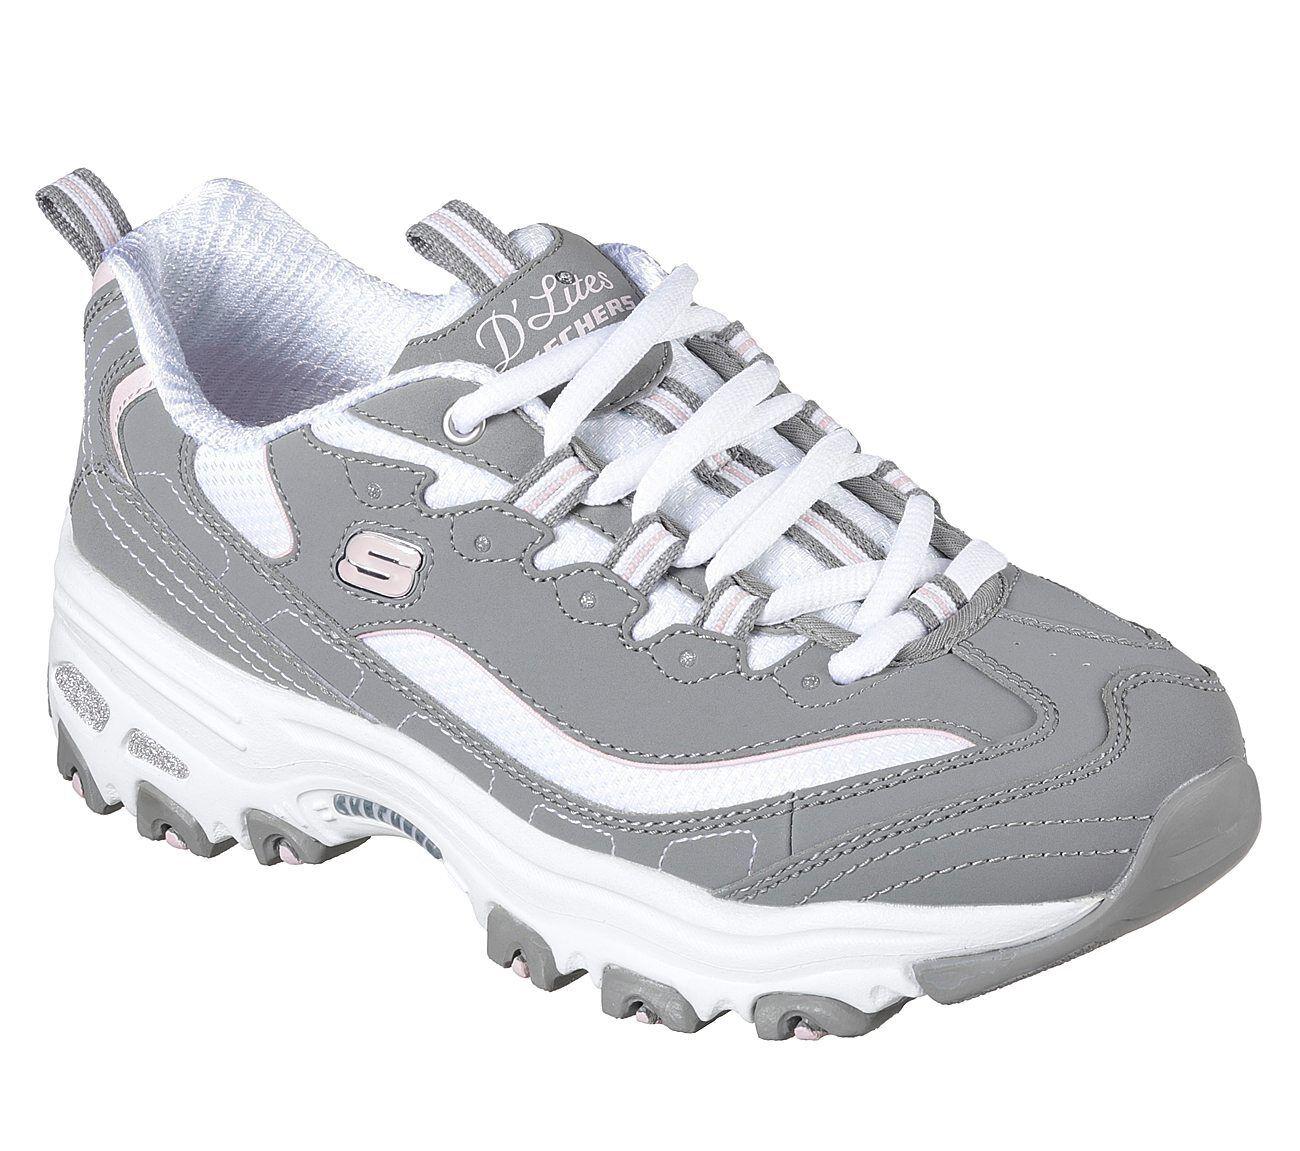 11930 Gray White D'lites Skechers Shoes Women's Sport Casual Comfort Memory Foam